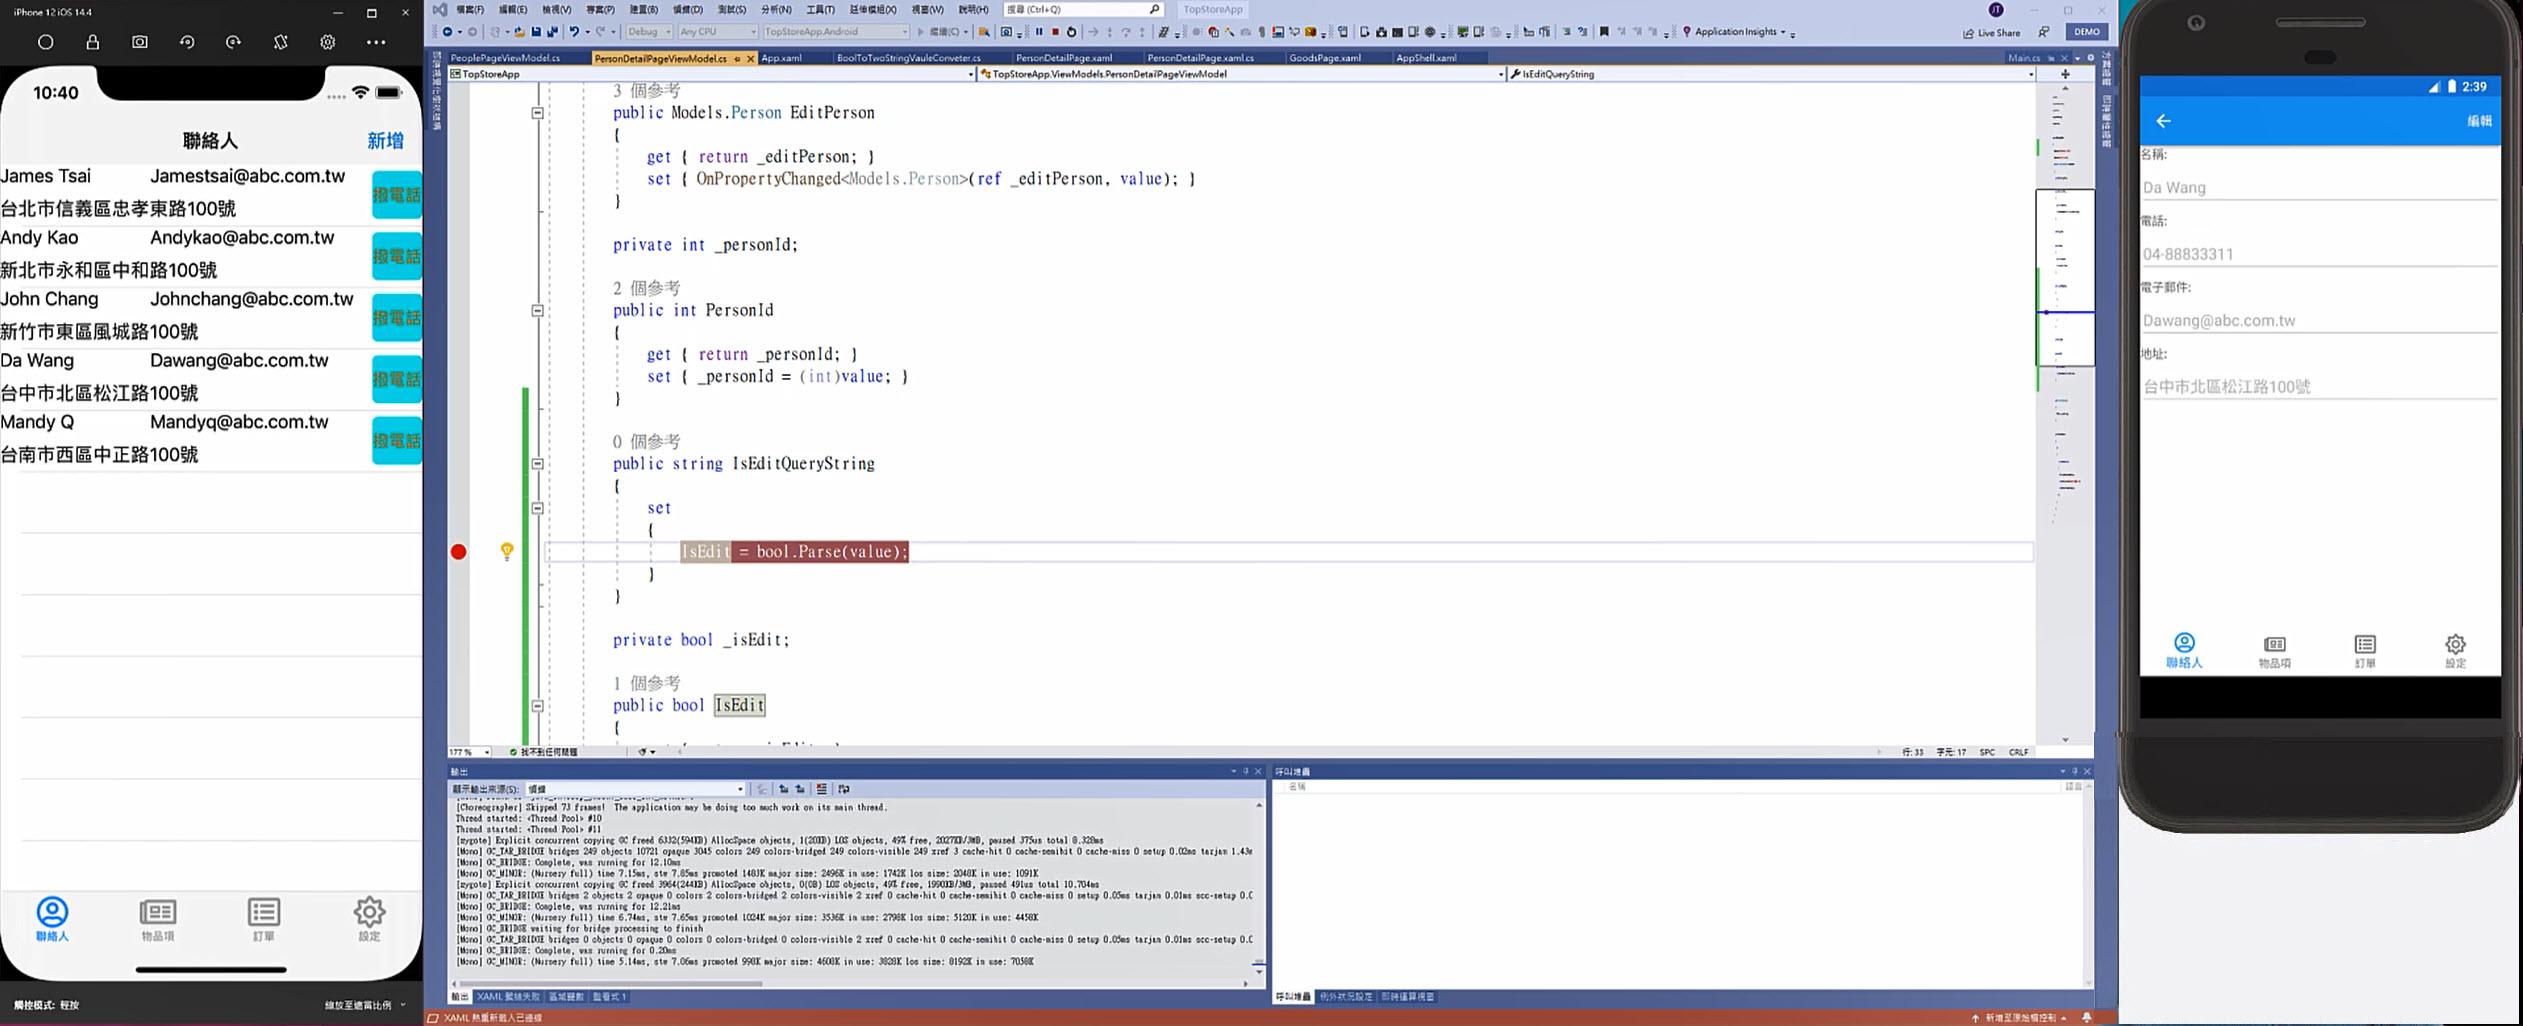 PersonDetailPage 所顯示的 ToolbarItem 文字為編輯